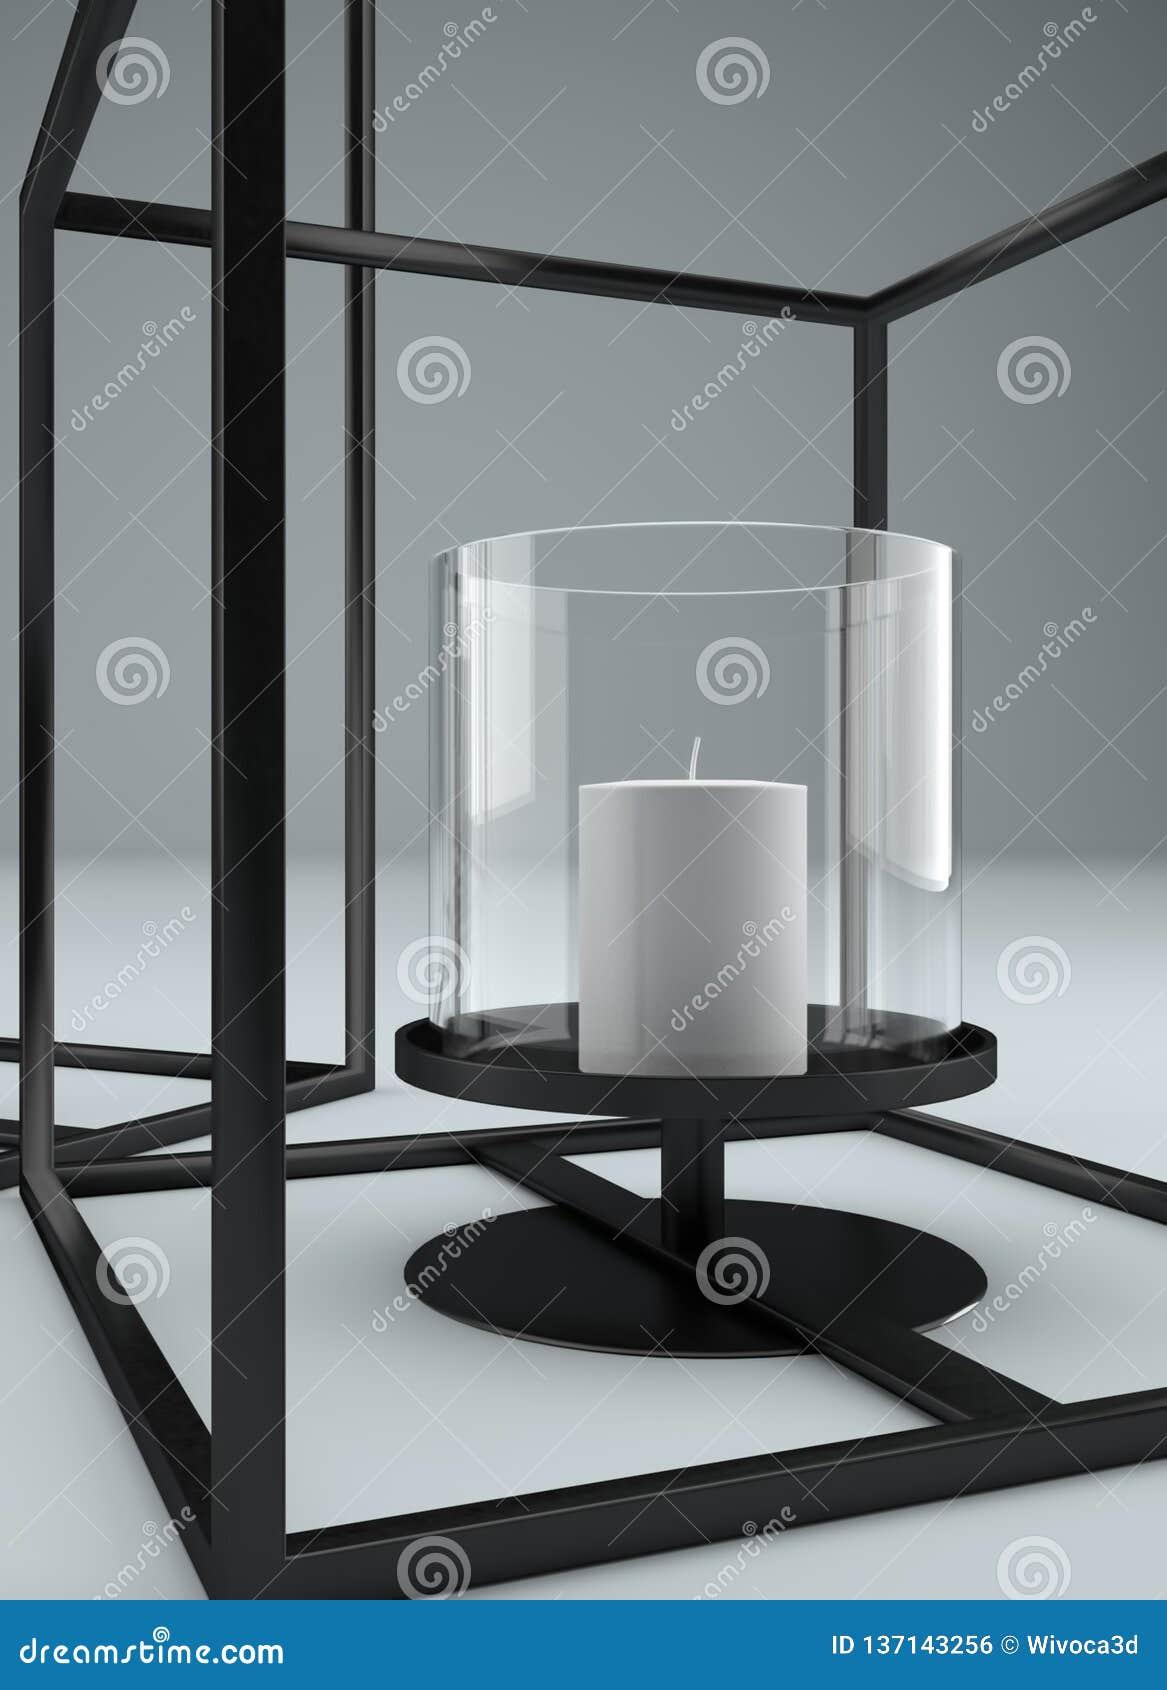 Picture of: Modern Rectangular Metal Framed Candle Holder Stock Illustration Illustration Of Rectangular Cube 137143256